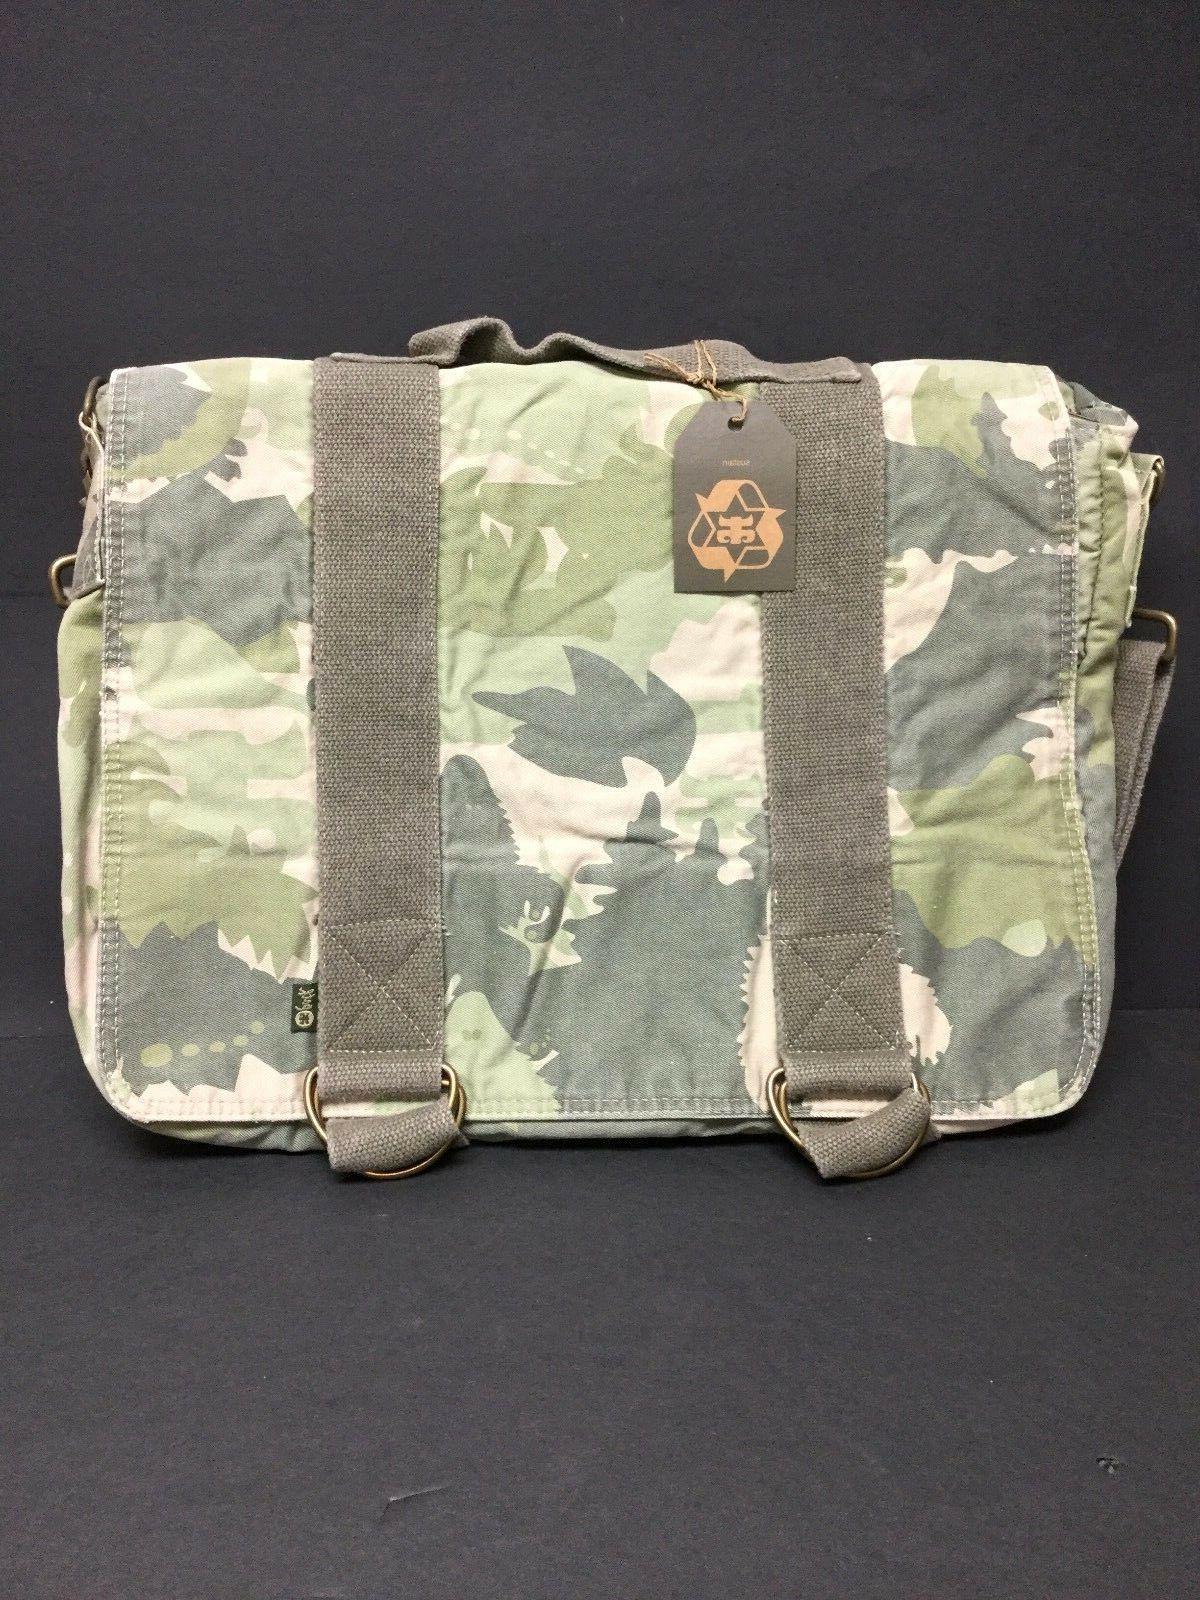 IPath Bag Case Utility Briefcase